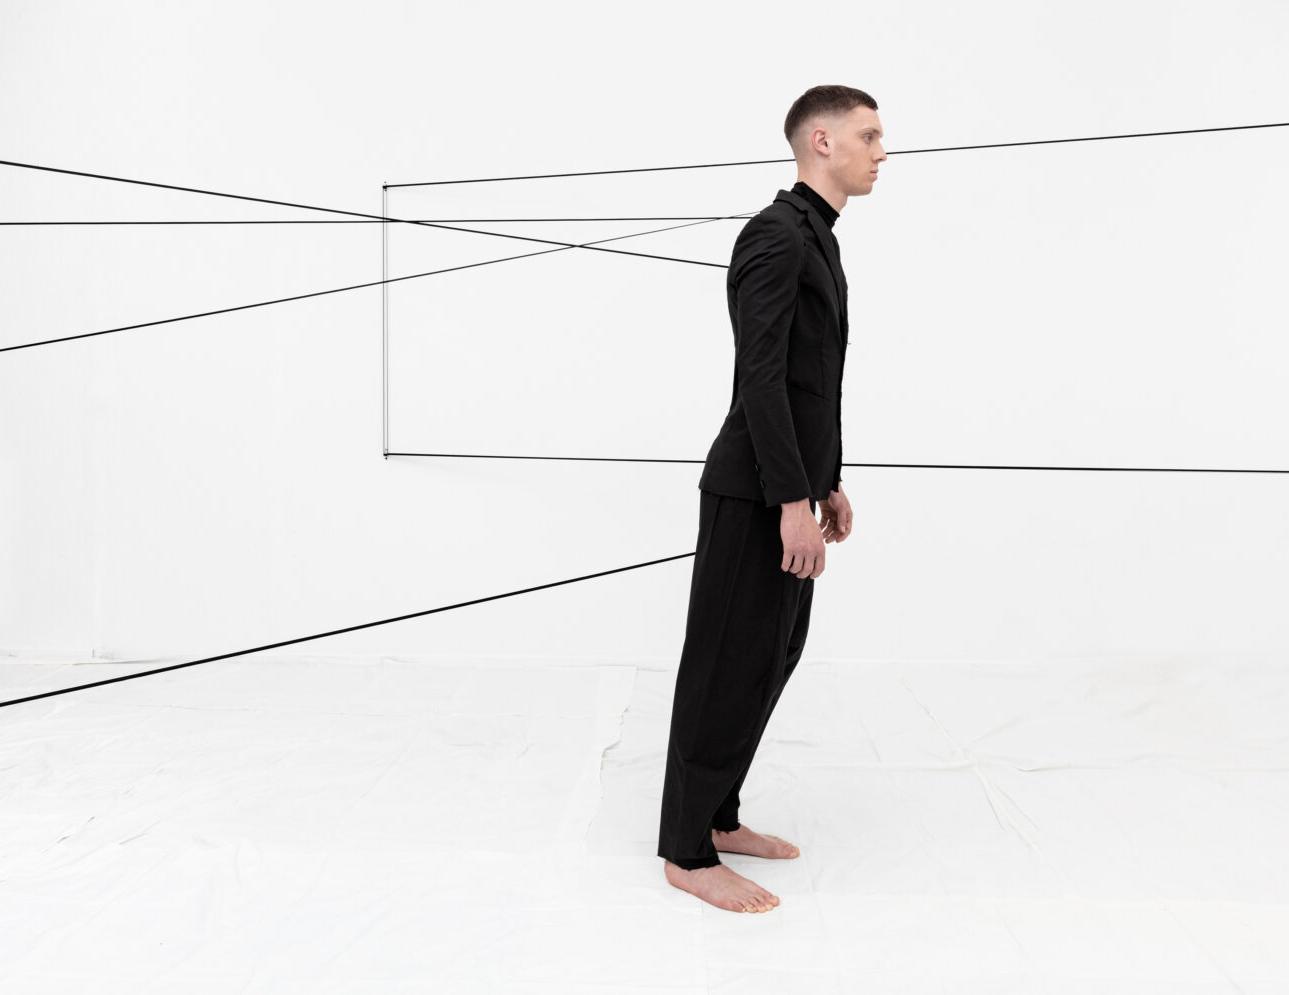 Galerie Rupert Pfab Anna-Maria Bogner Aleksandra Kurkowski ArtJunk